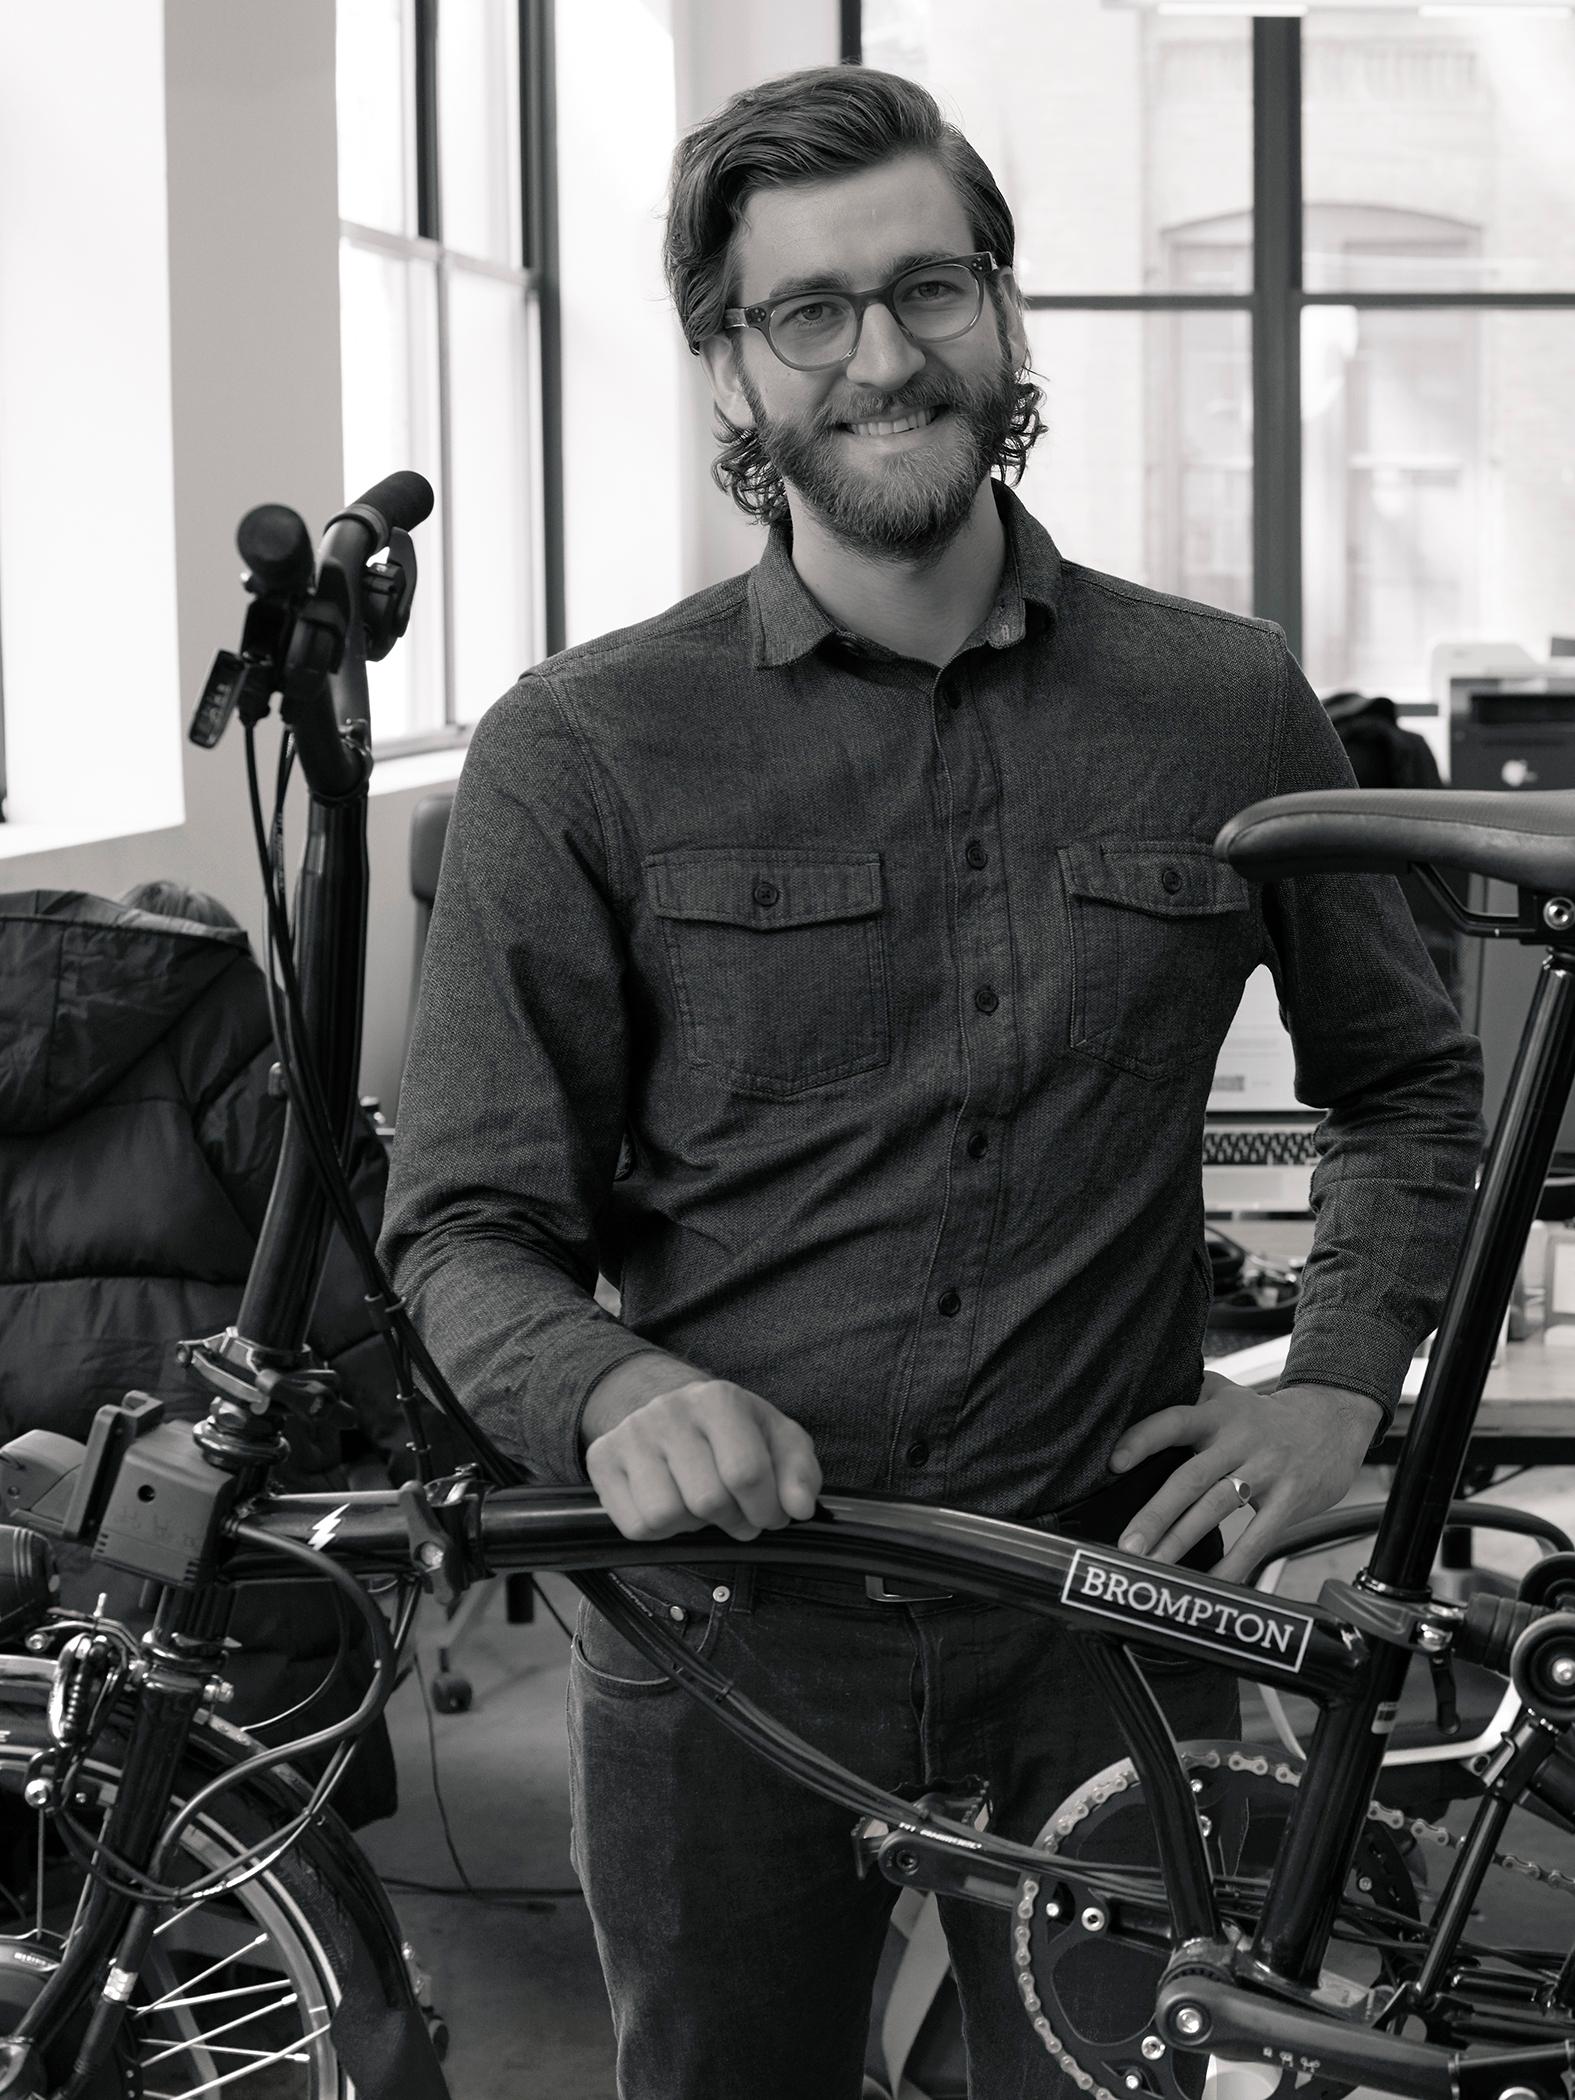 Peter Puskauskas of Brompton Bikes